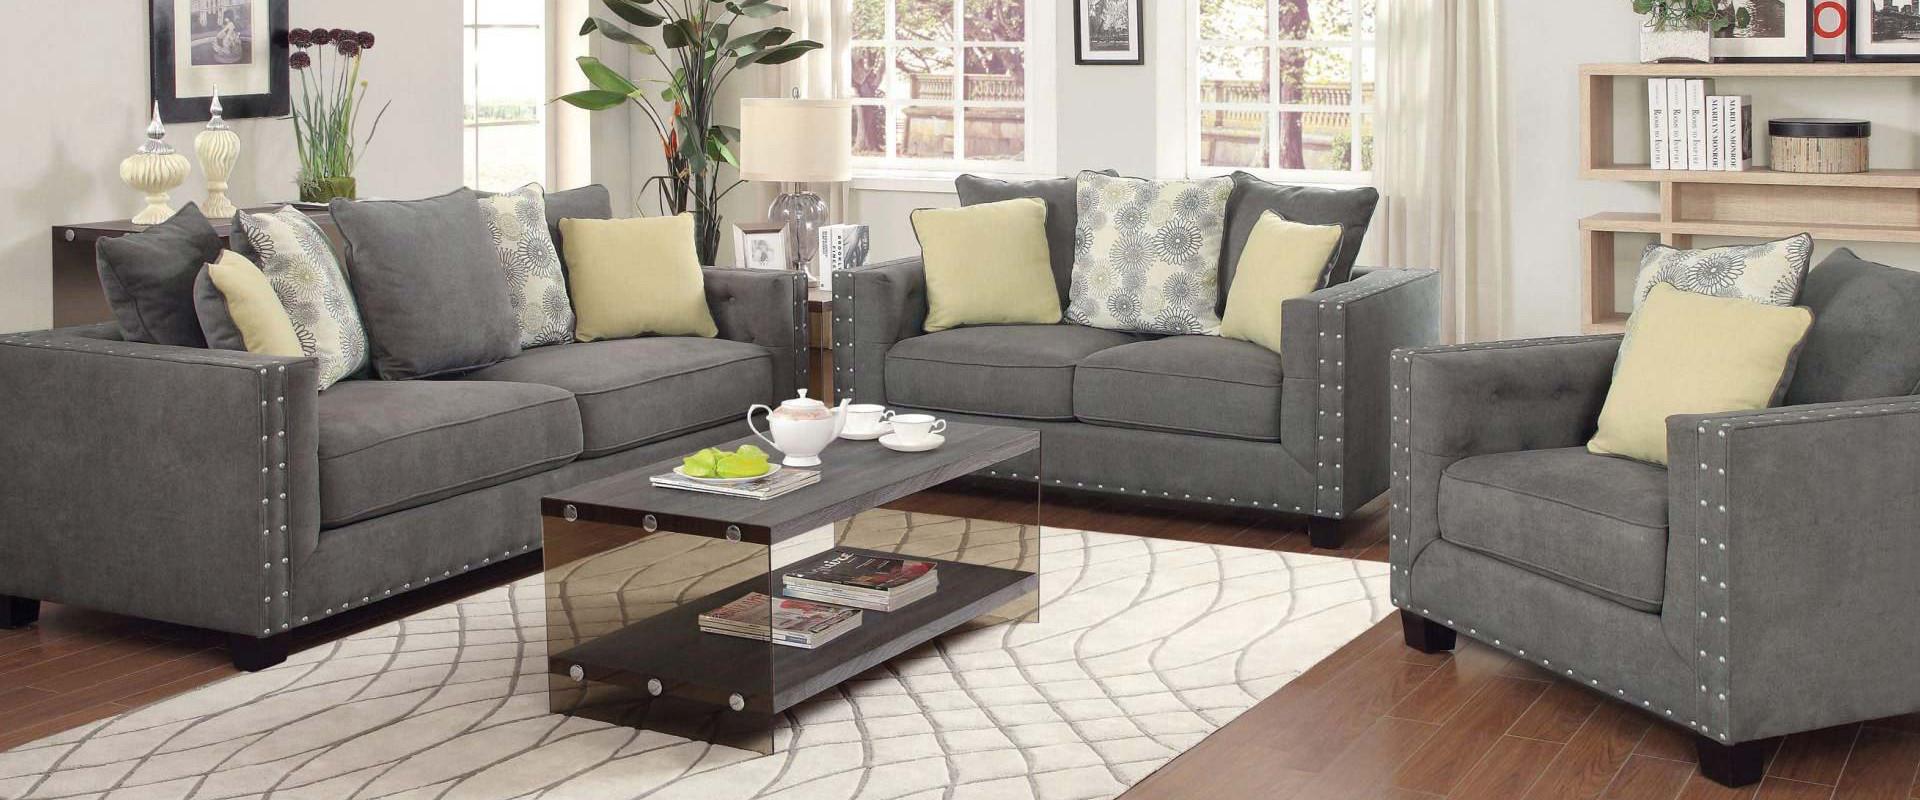 Meer sfeer in je woonkamer door mooie meubels for Woning meubels